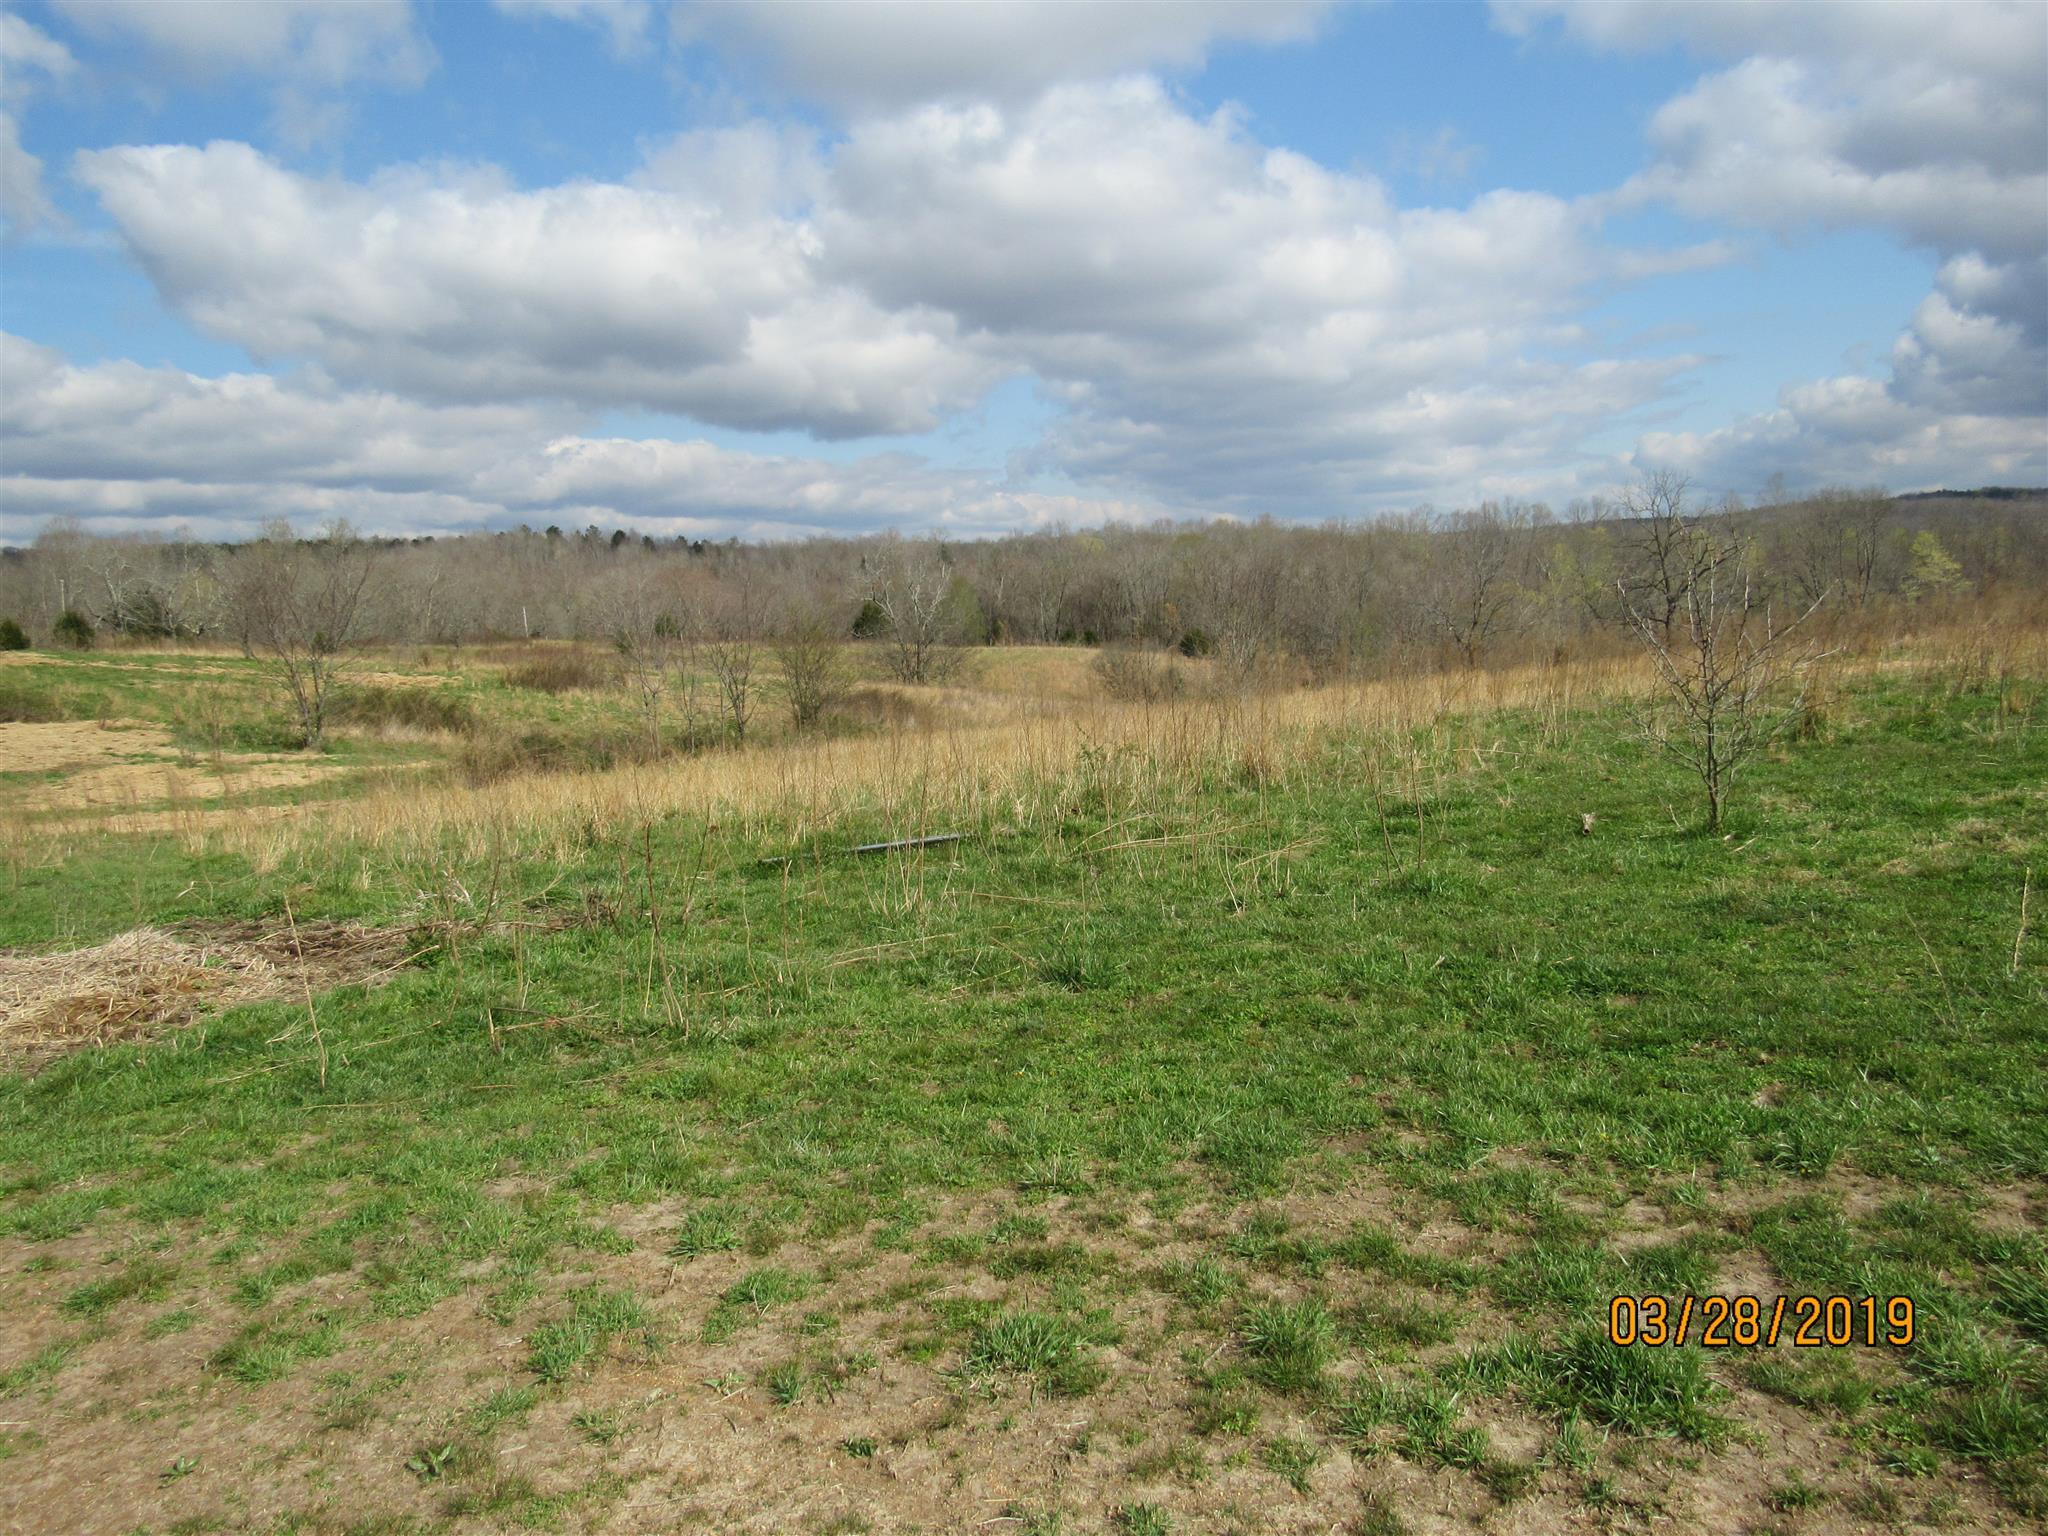 0 Trace Creek Rd, Hohenwald, TN 38462 - Hohenwald, TN real estate listing